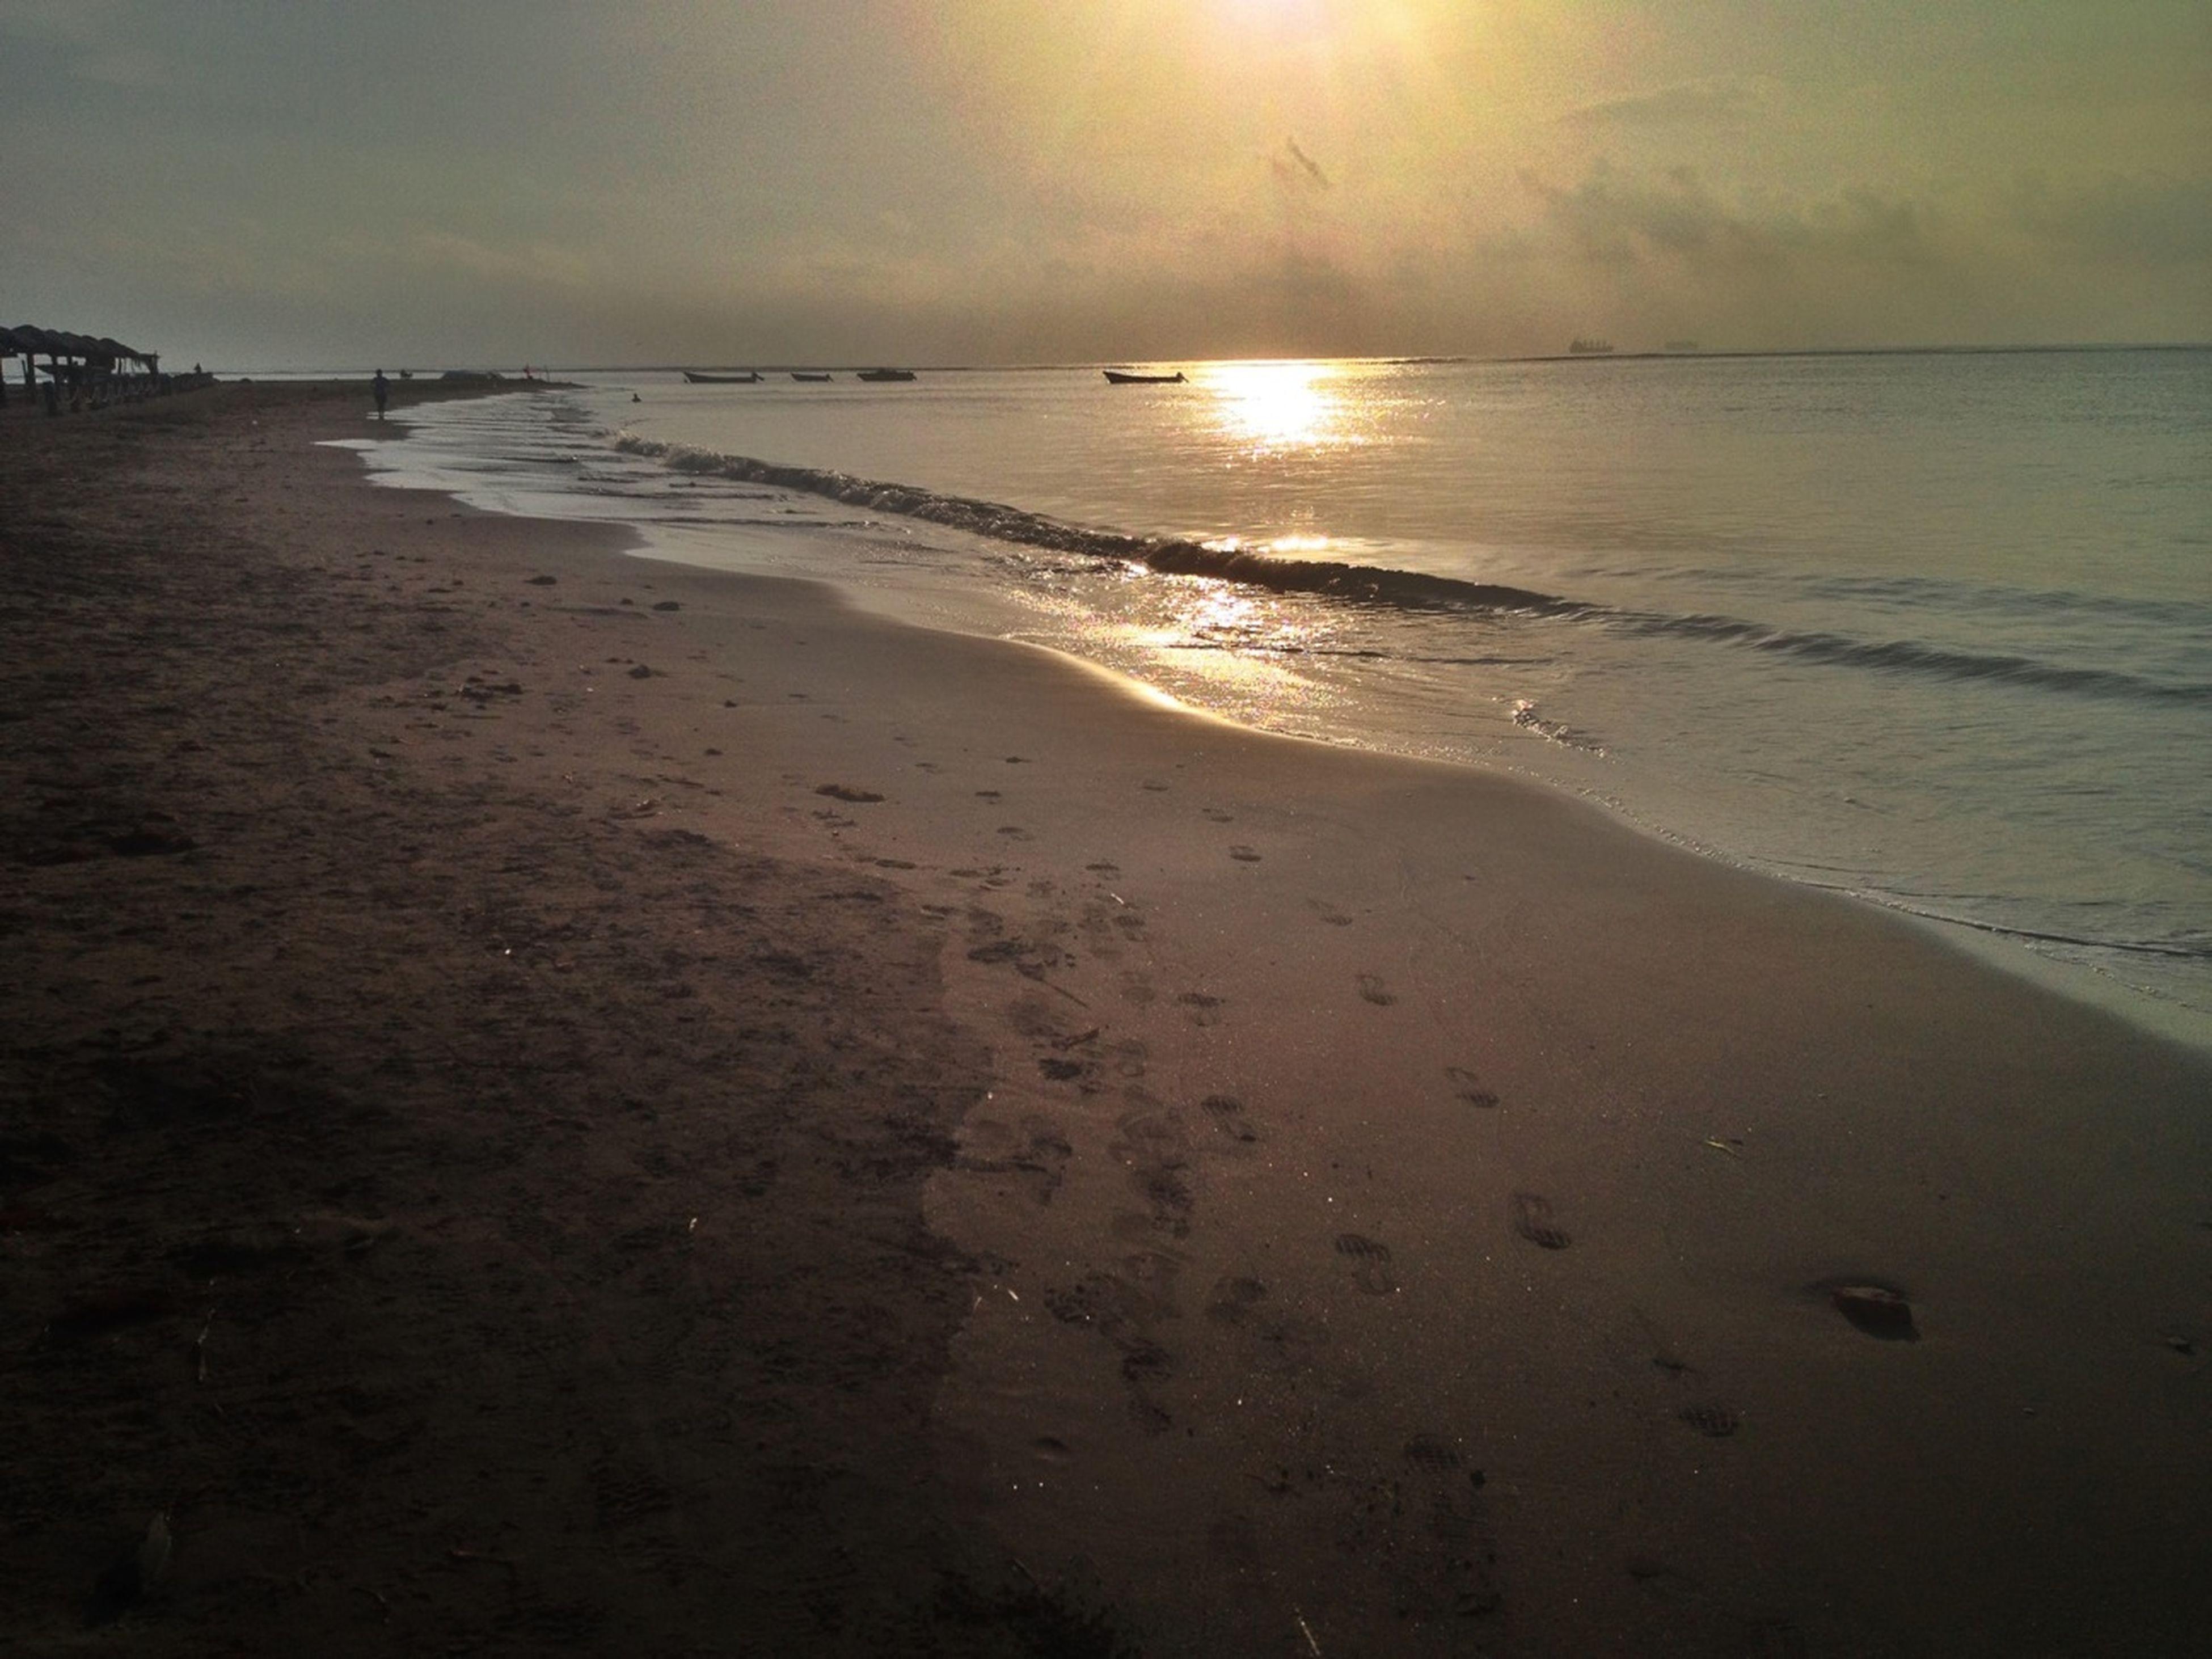 sea, beach, water, horizon over water, shore, sunset, tranquil scene, scenics, tranquility, beauty in nature, sky, sun, sand, reflection, nature, idyllic, coastline, wave, sunlight, silhouette